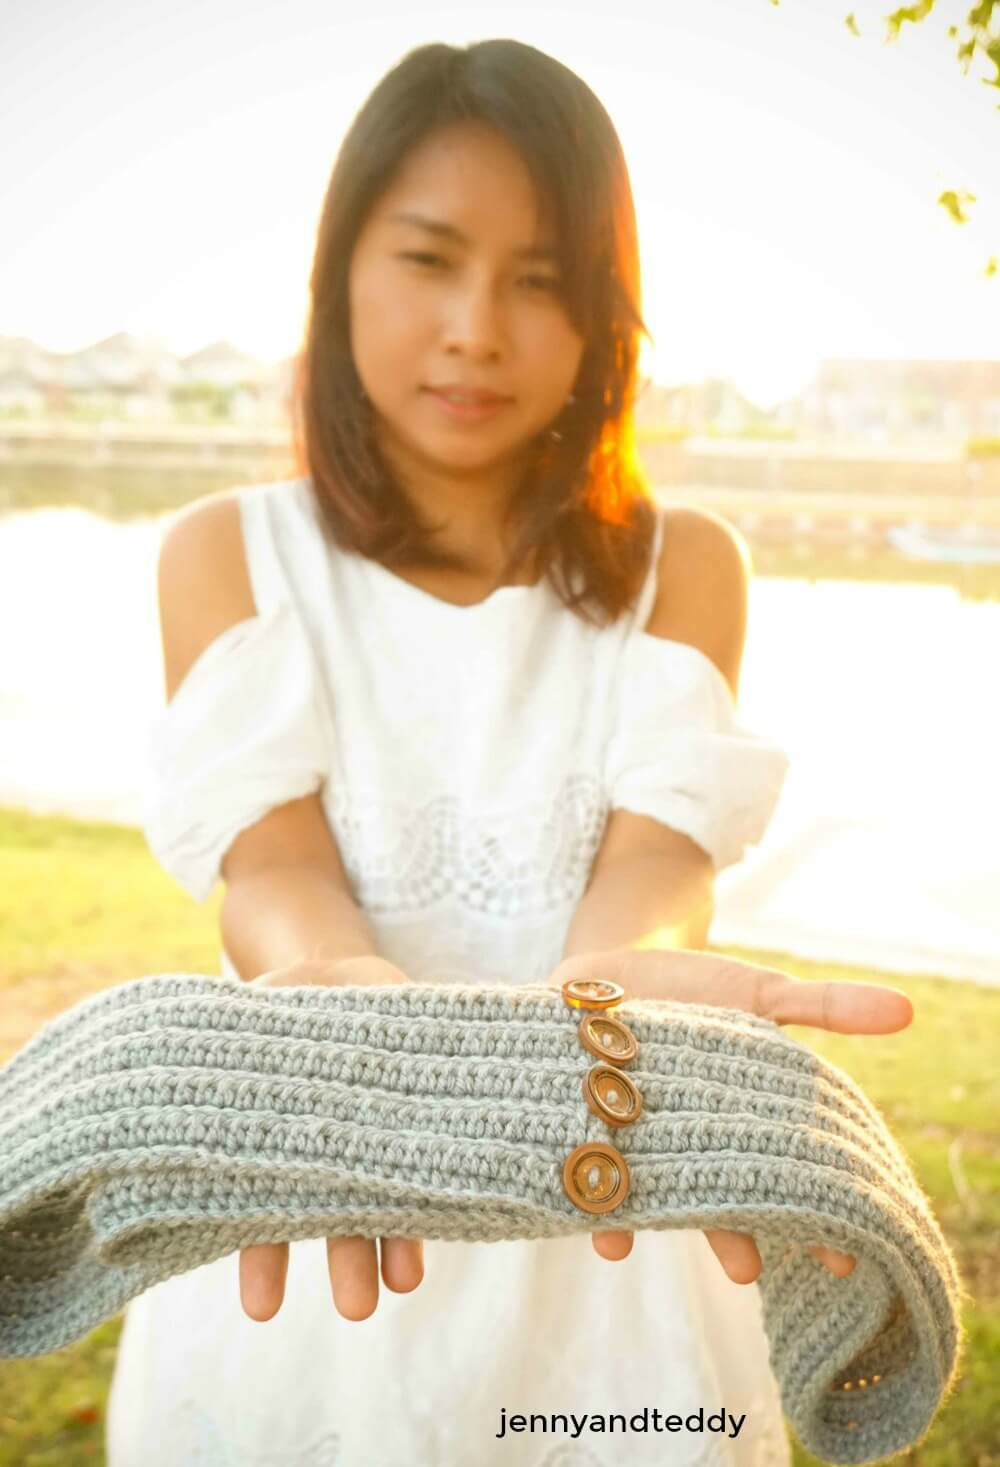 c crochet infinity scarf tutorial for beginner